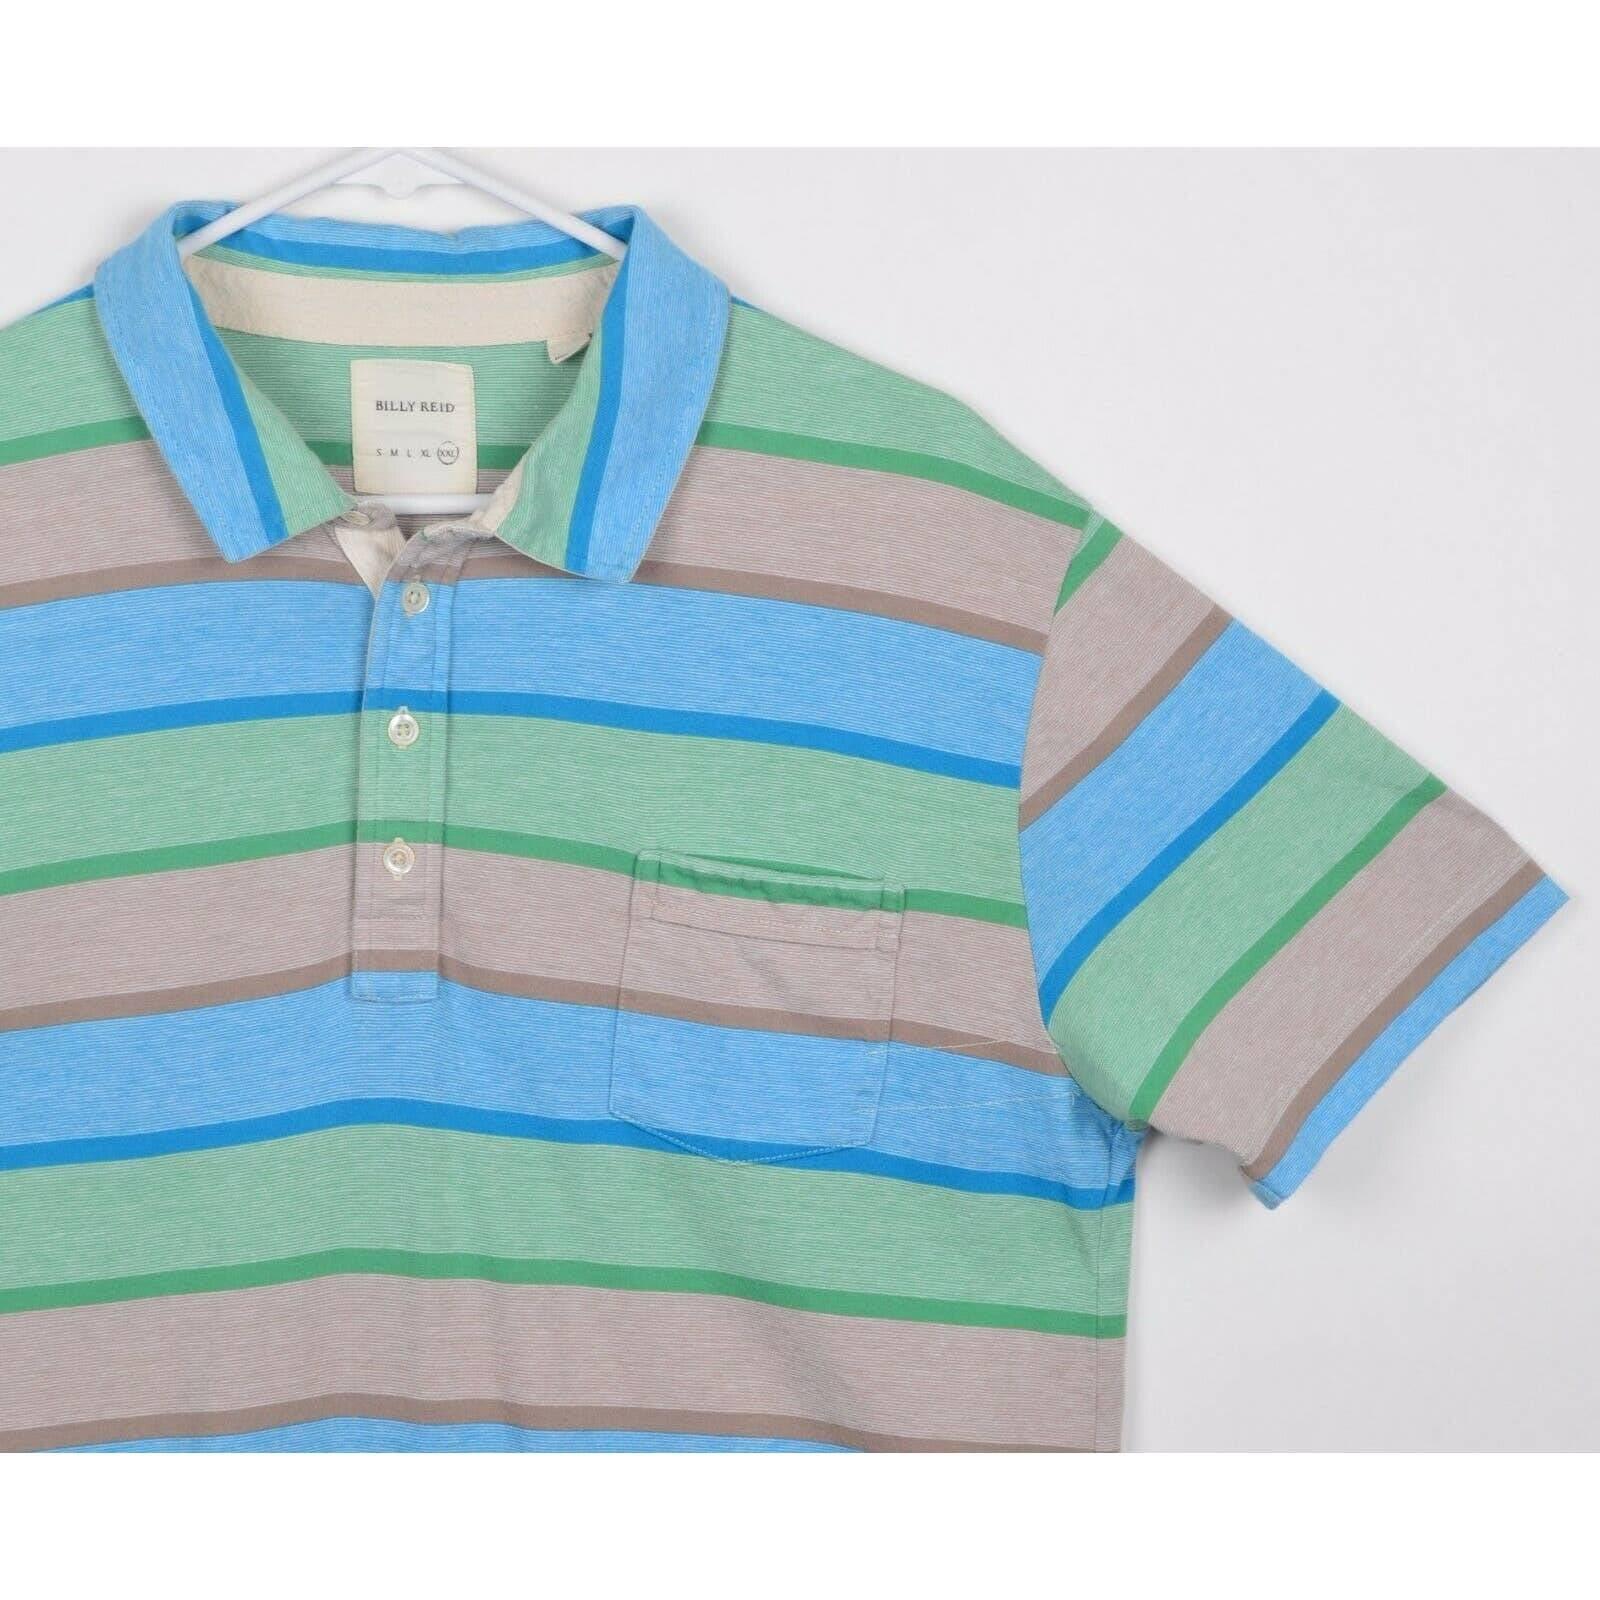 Billy Reid 2XL Blue Striped Polo Shirt